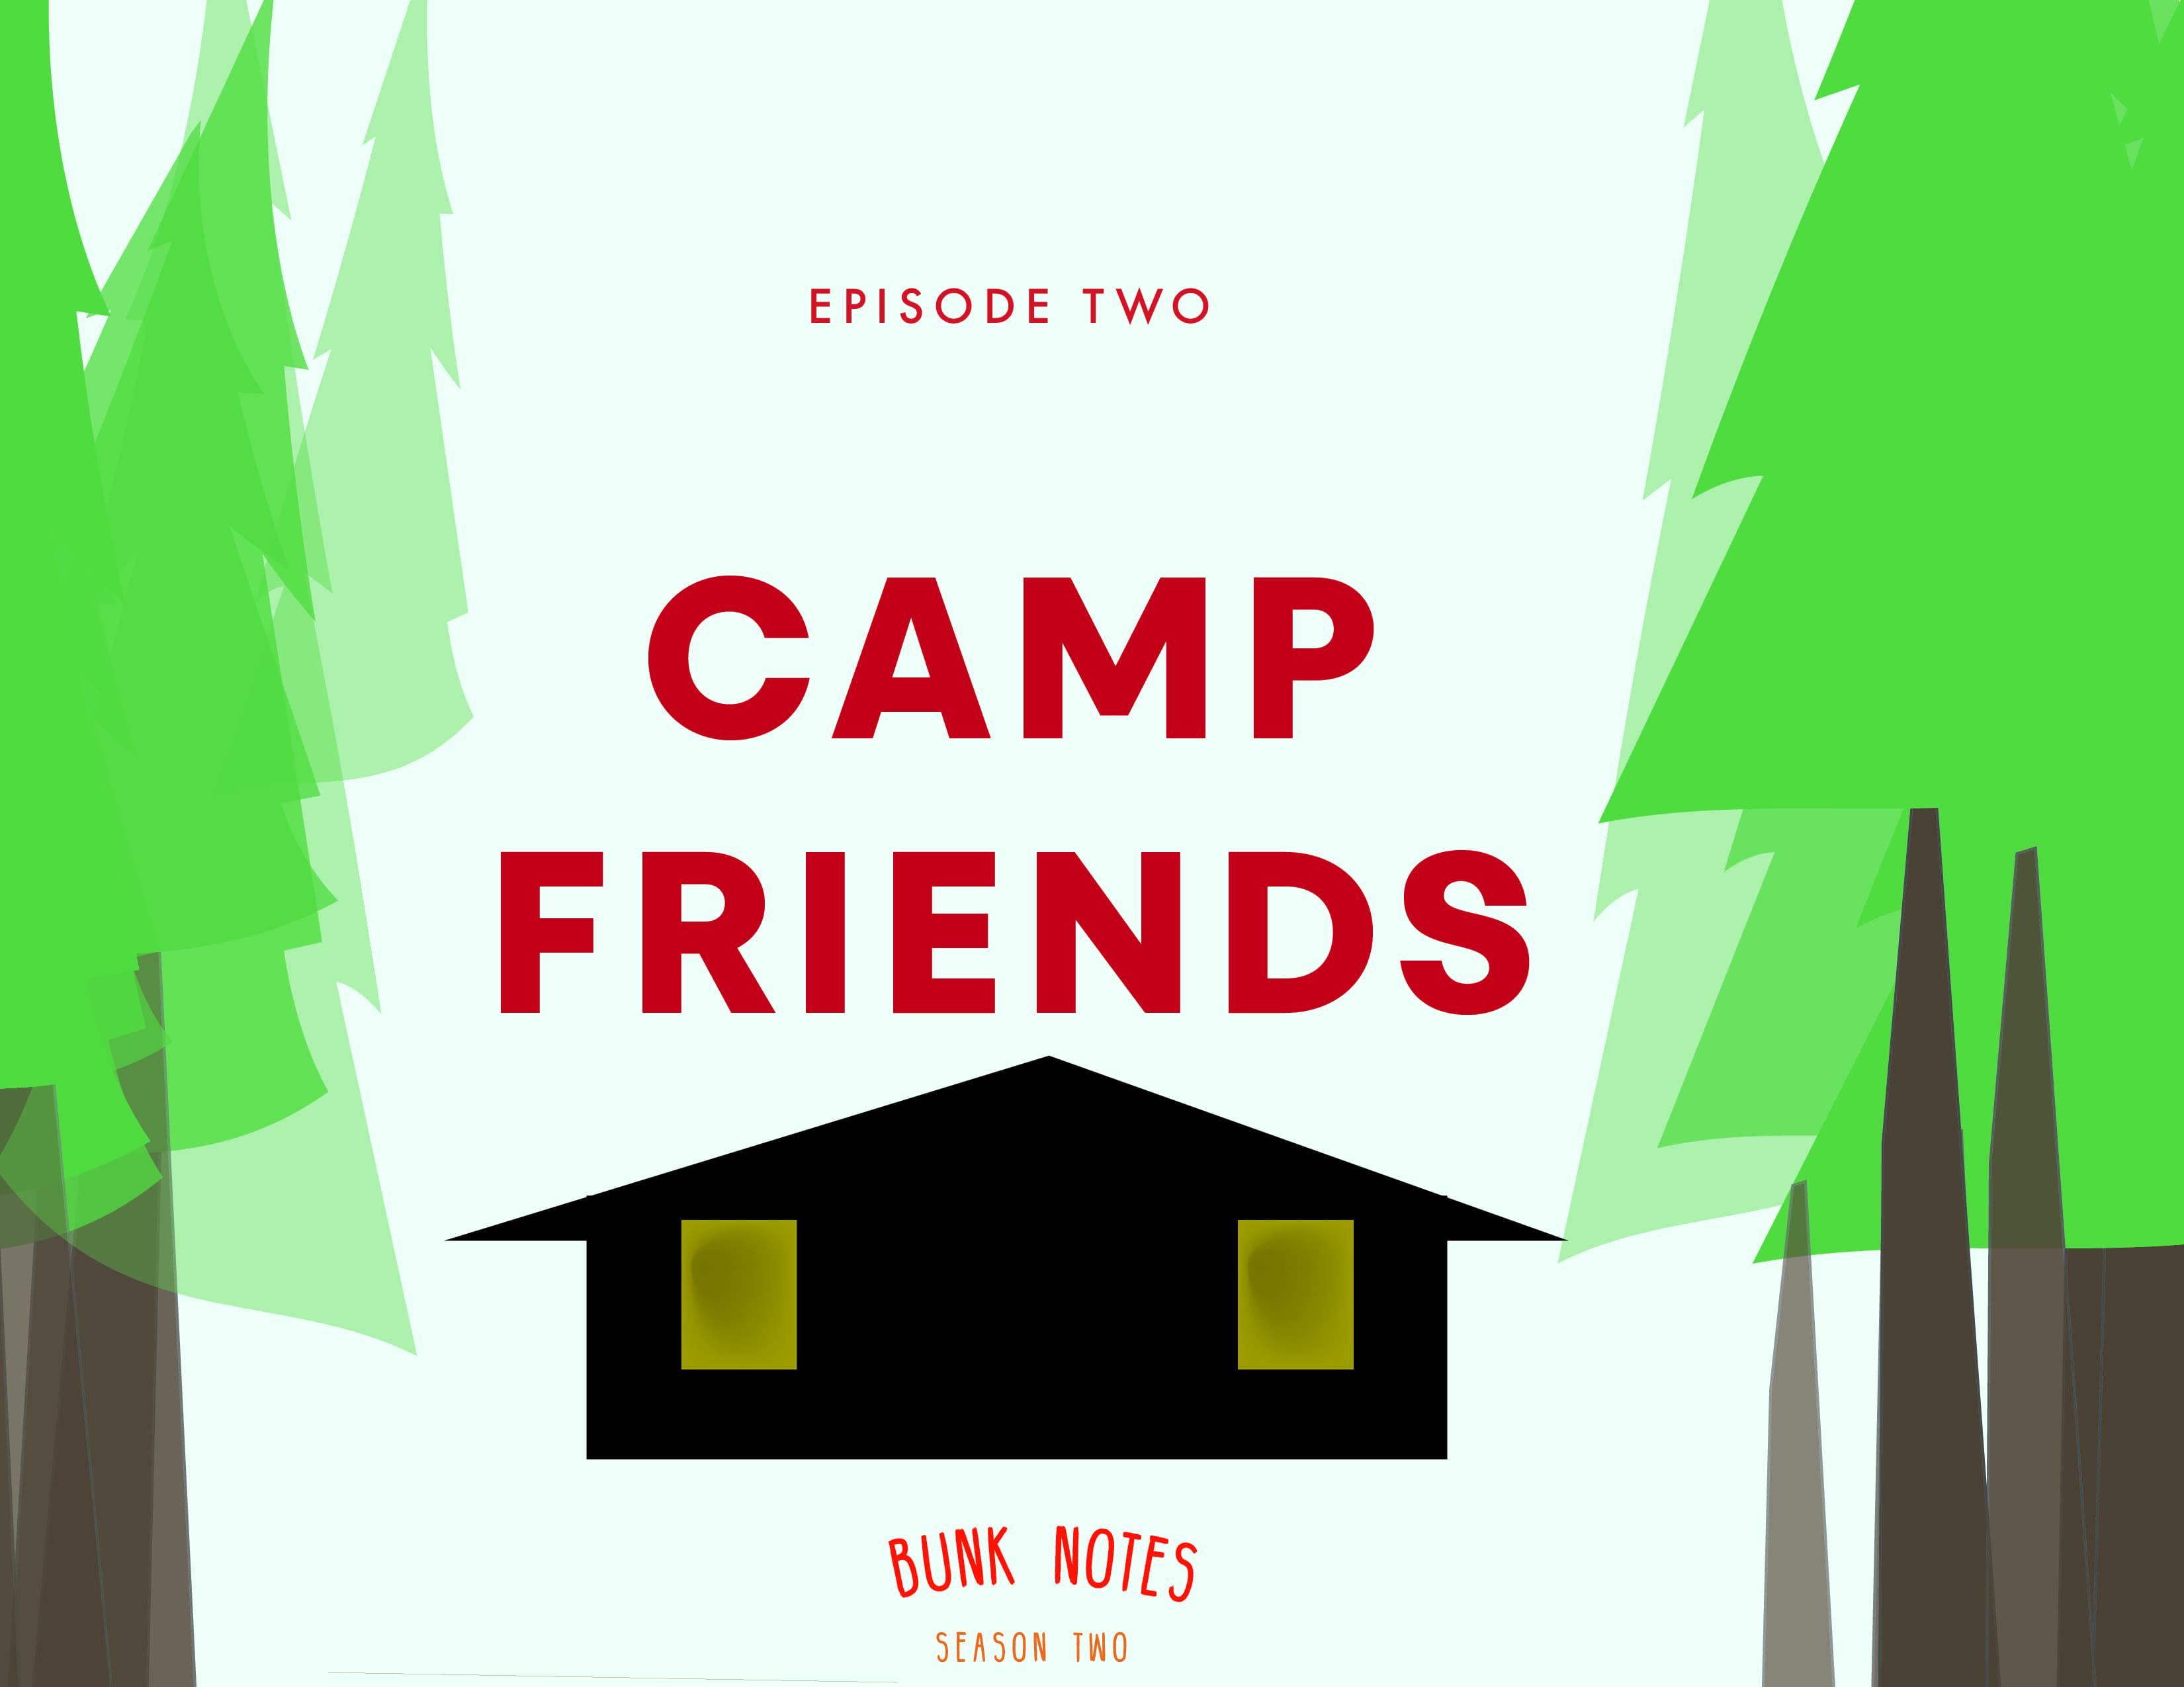 Camp Friends - Bunk Notes